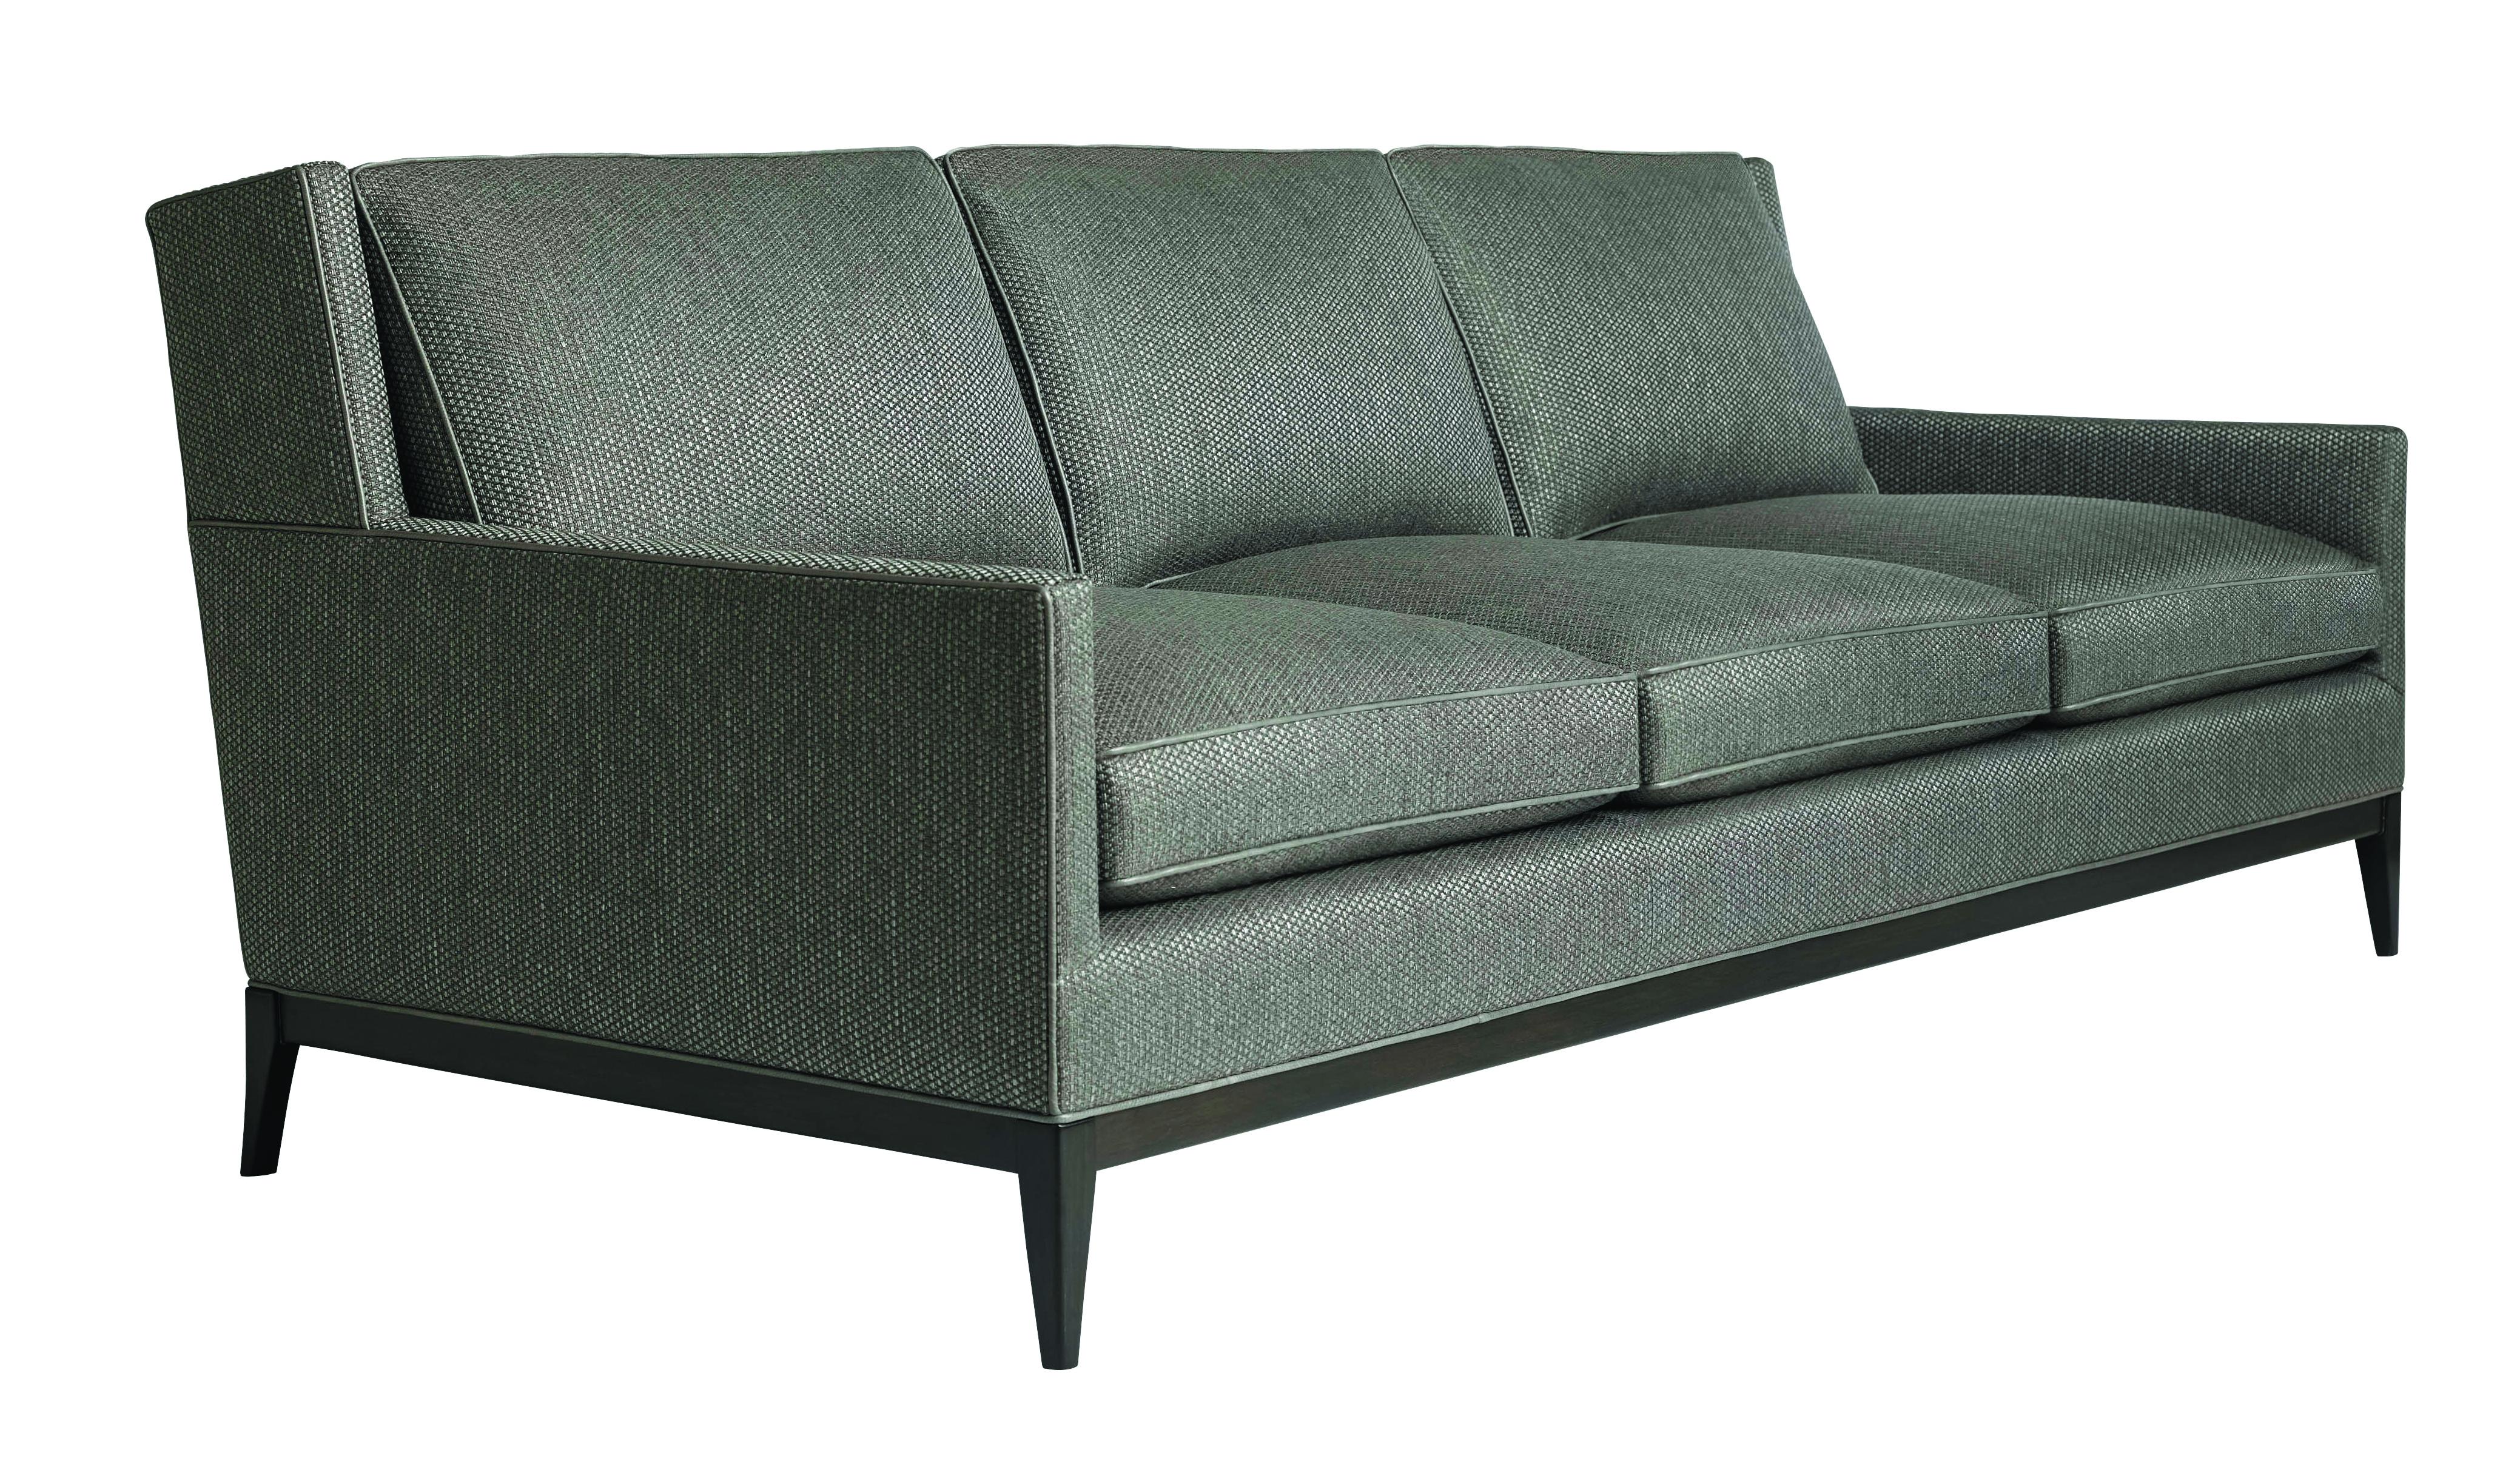 Elegant sofa Canapé Différence